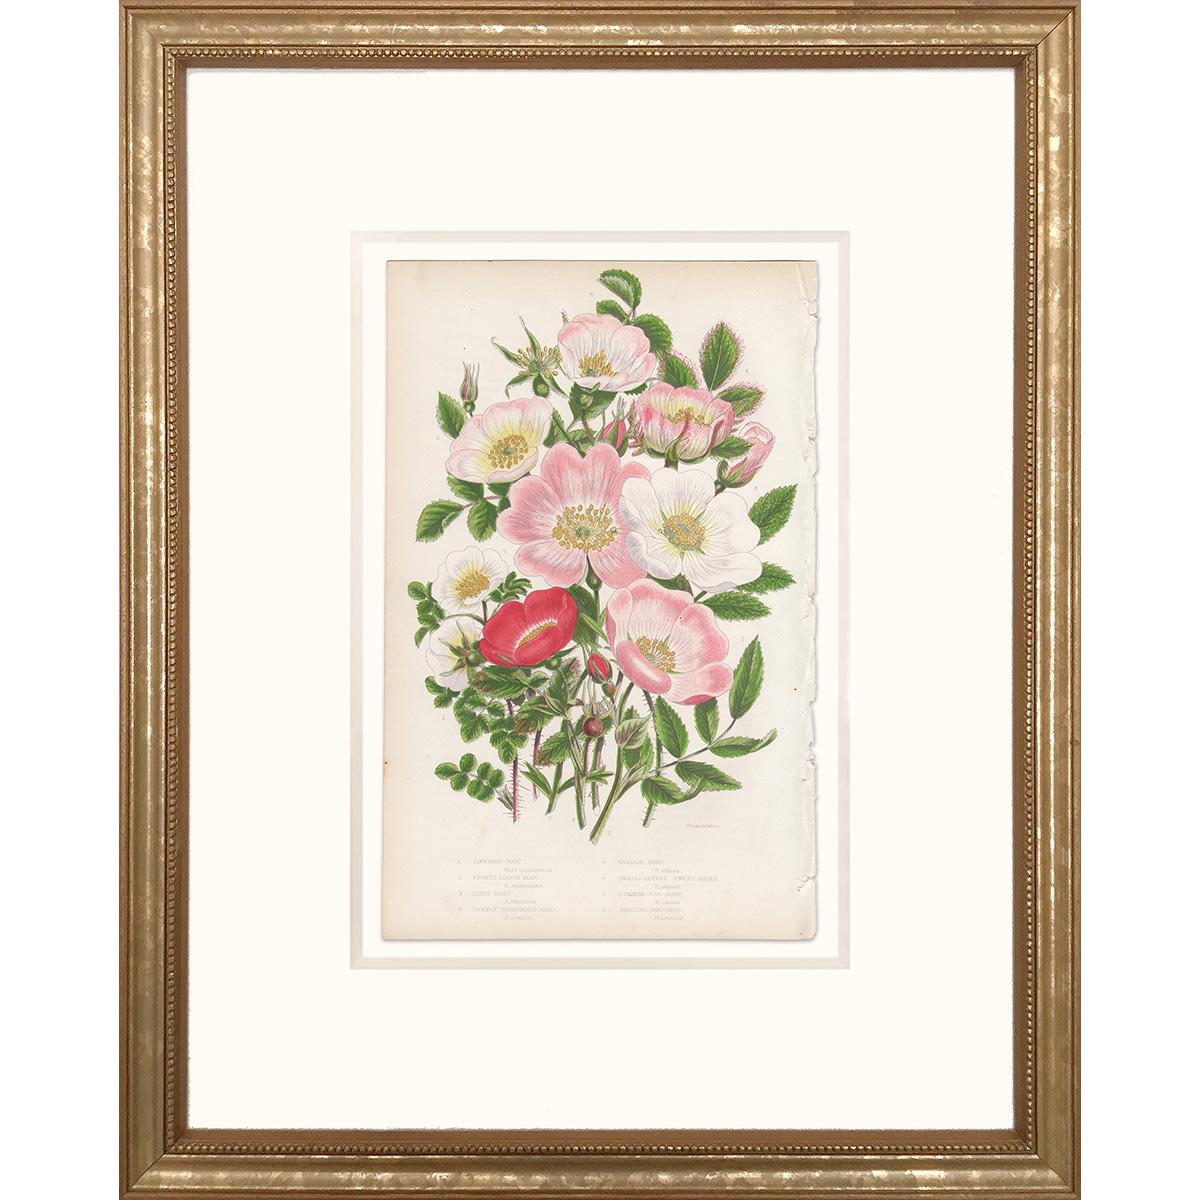 Anne Pratt Plate 71 Rose, Sweet-briar, Dog-rose - Framed print